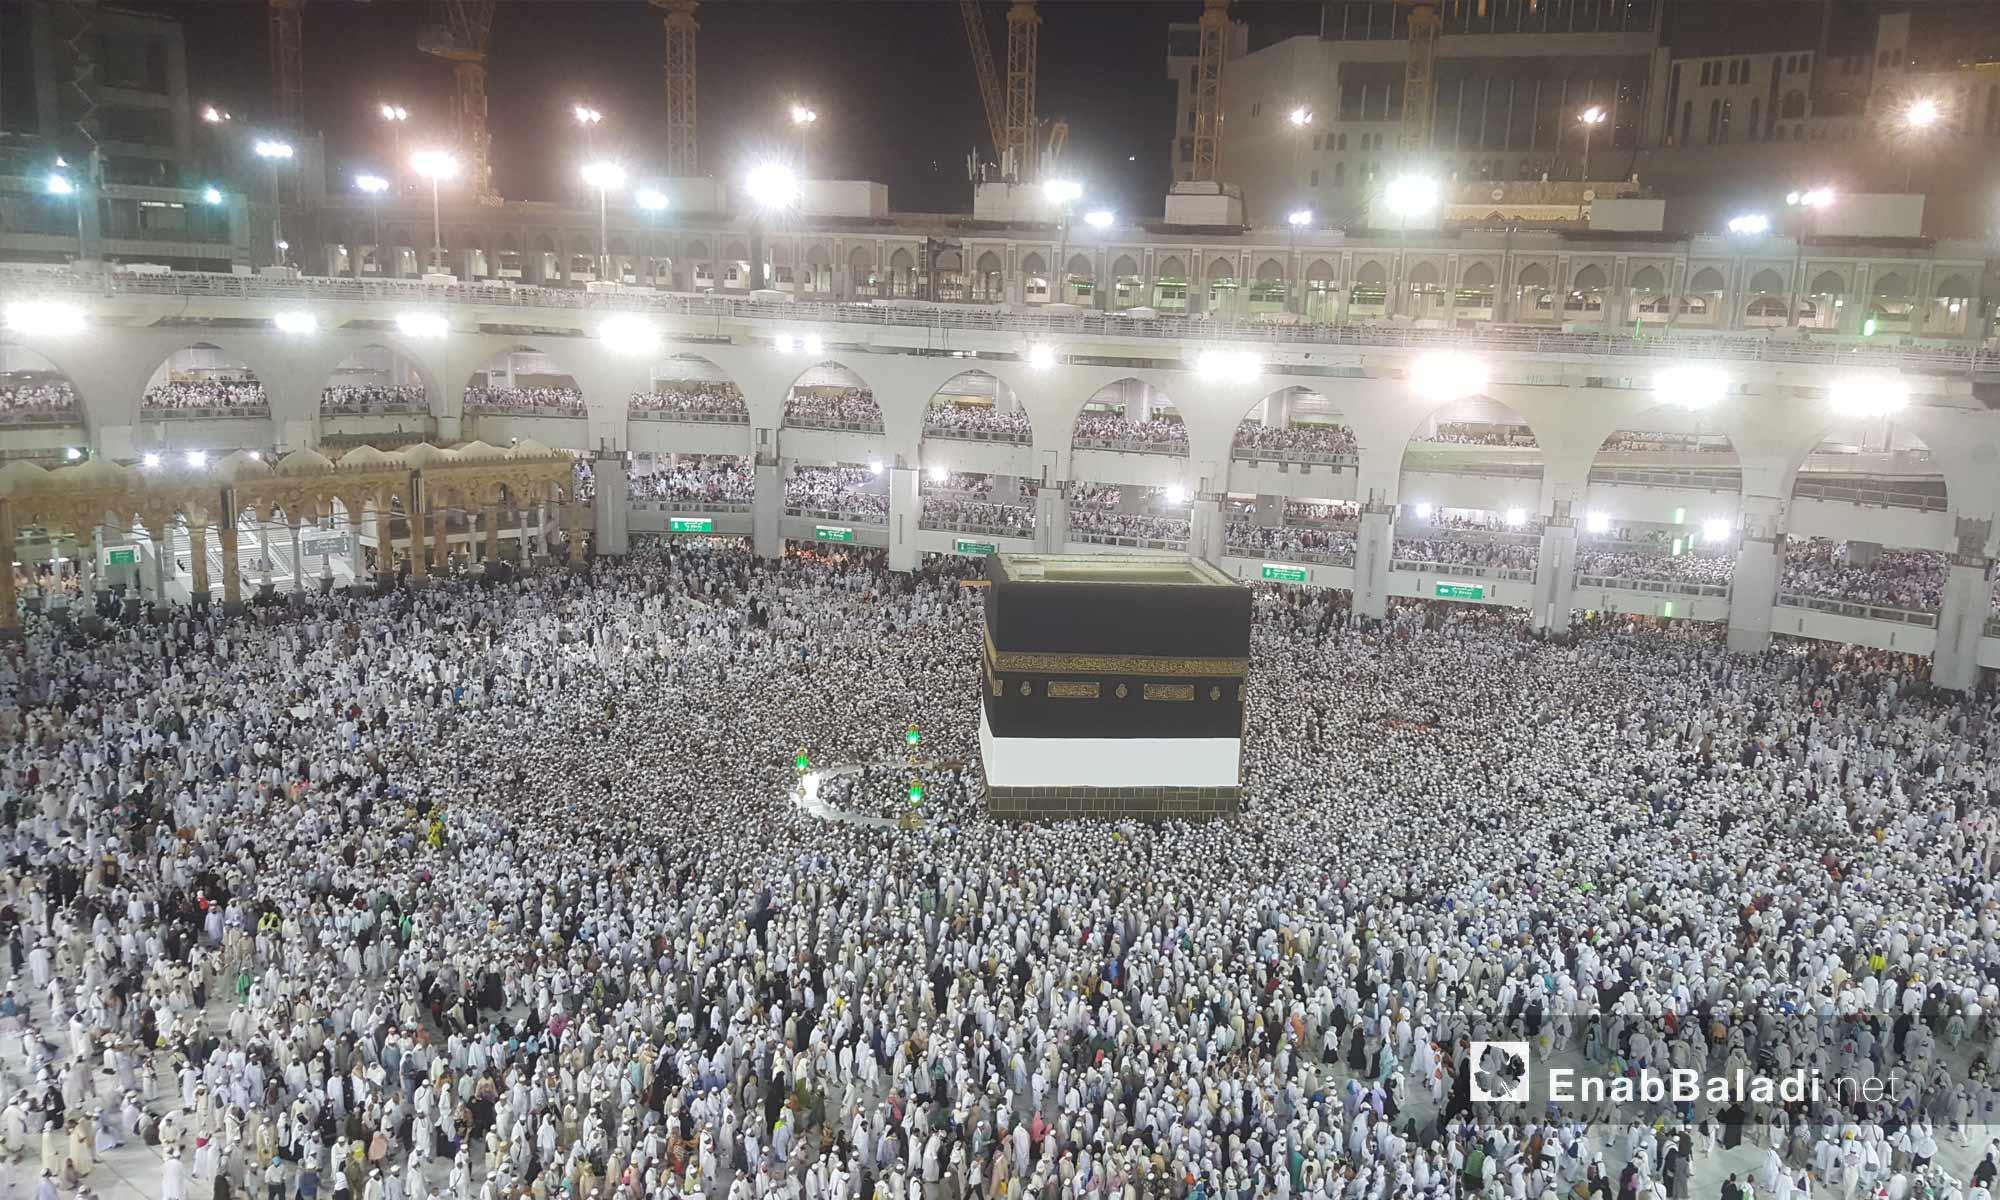 Pilgrims perform the tawaf ritual around al-Kaʿbah al-Musharrafah – August 4, 2018 (Enab Baladi)